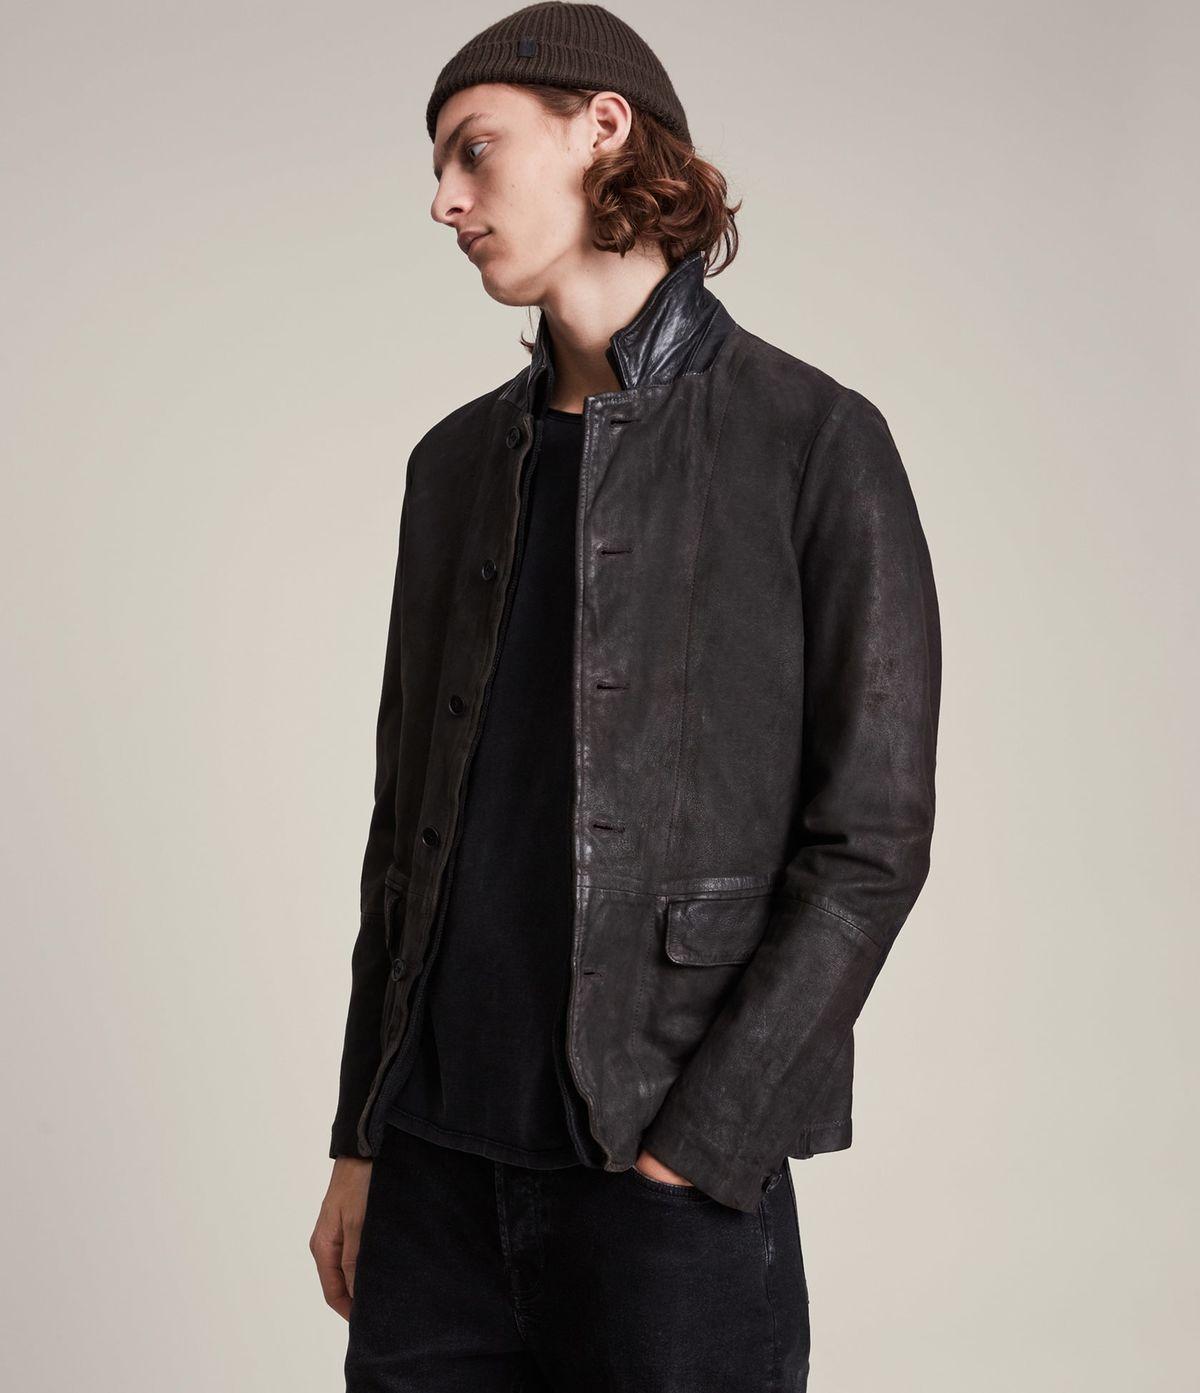 Men's Survey Leather Jacket - Side View